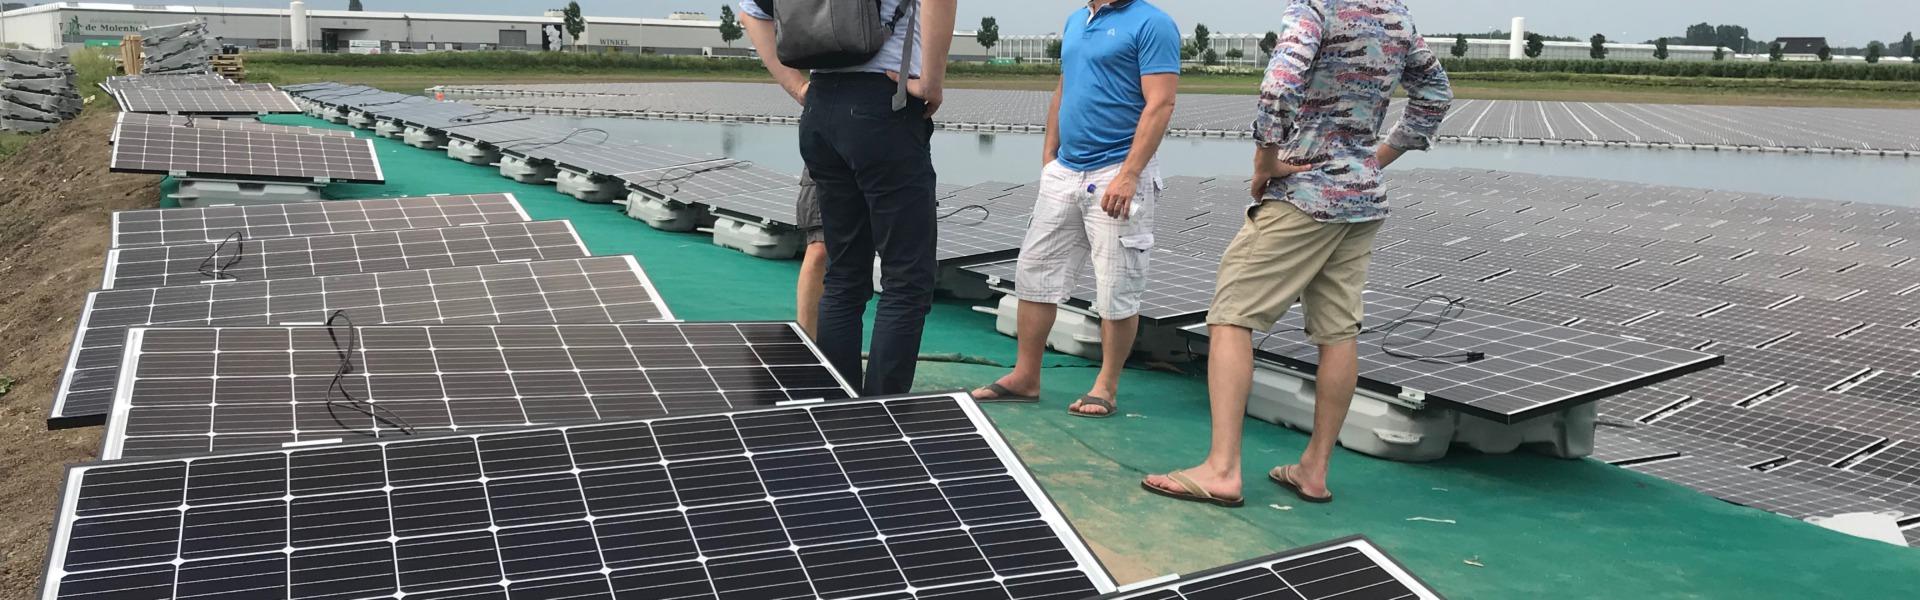 Burgers van energiecoöperatie Lingewaard